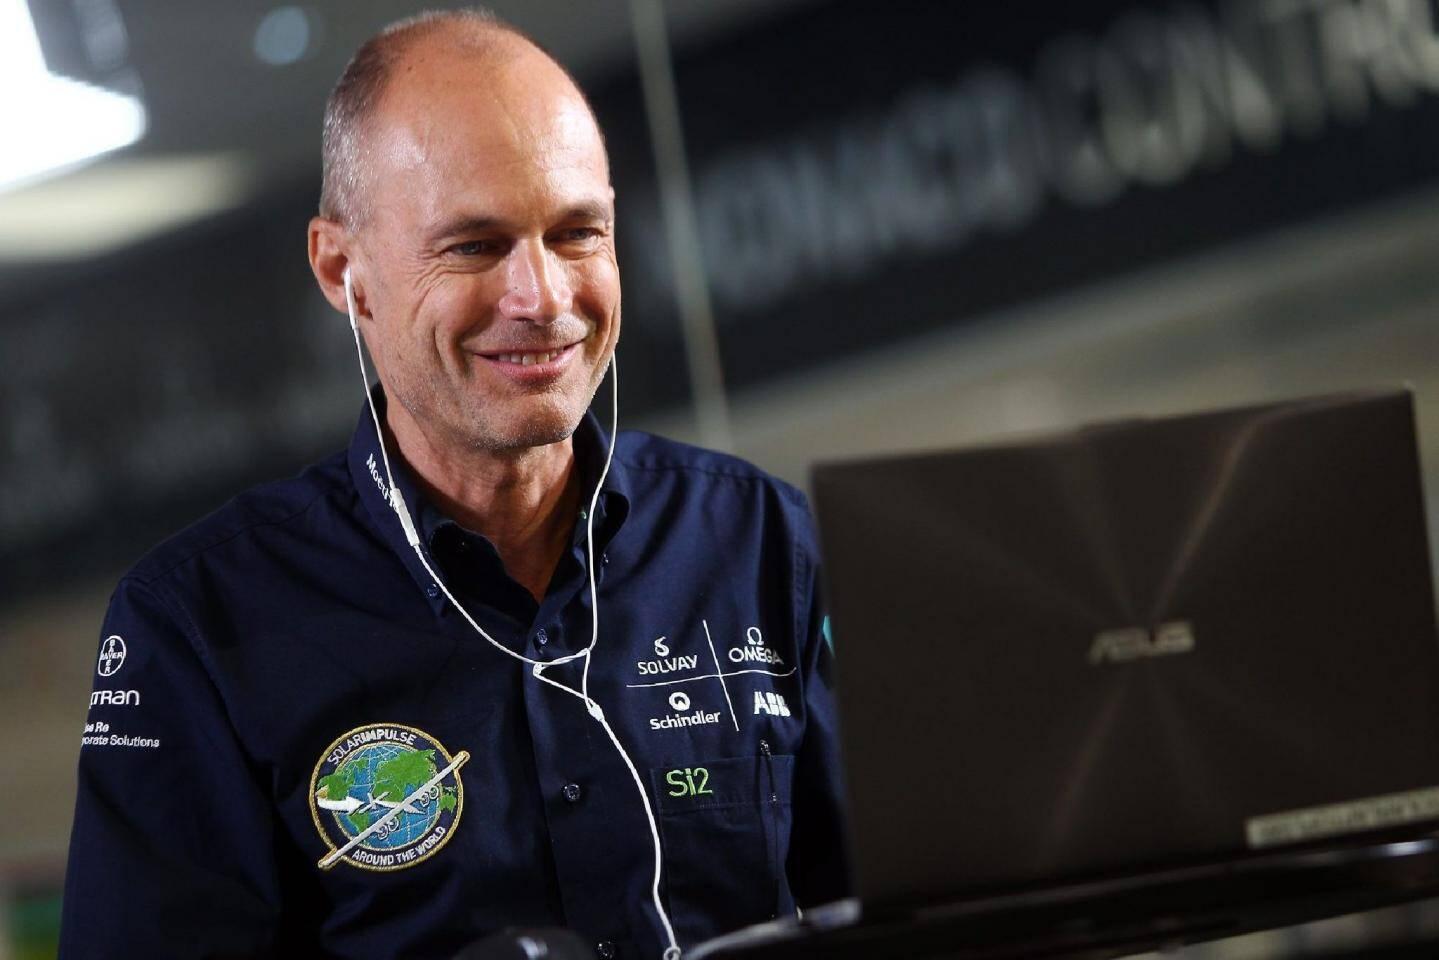 Solar Impulse en vol pour Hawai : « Le momen - 29734499.jpg